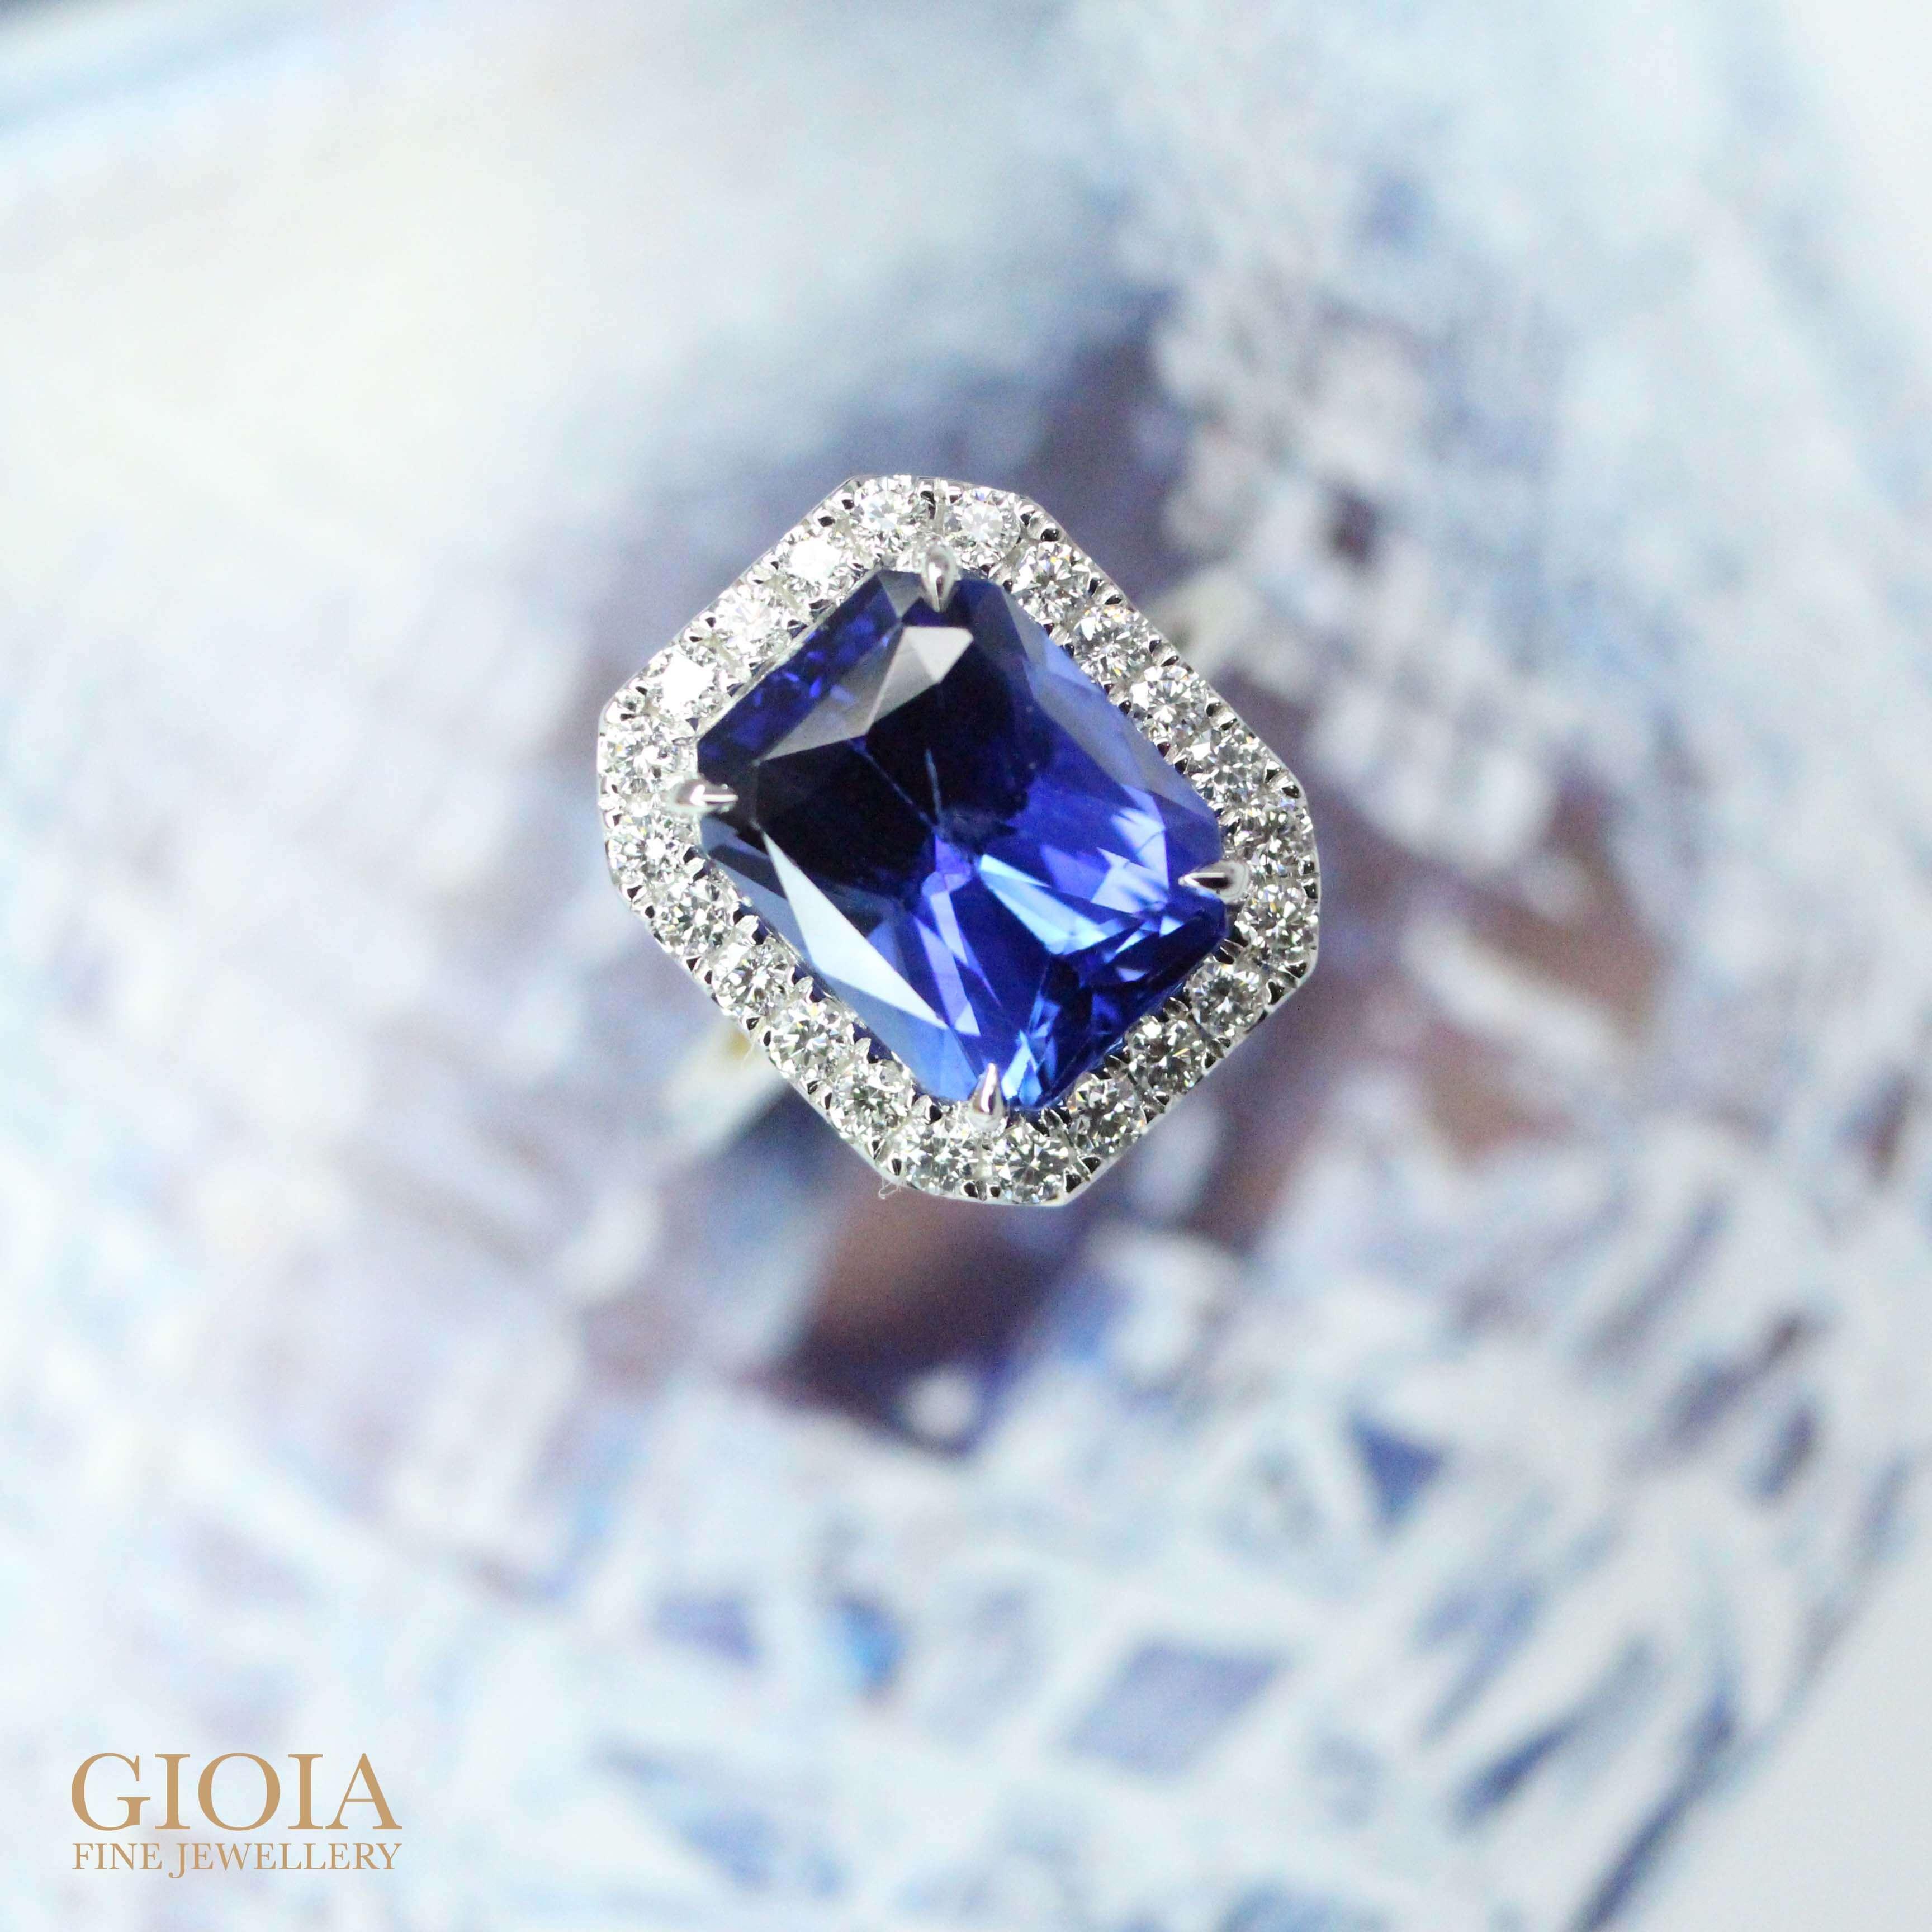 Customised blue sapphire engagement with halo round diamond surrounding the coloured gemstone | Local Singapore Bespoke jewellery